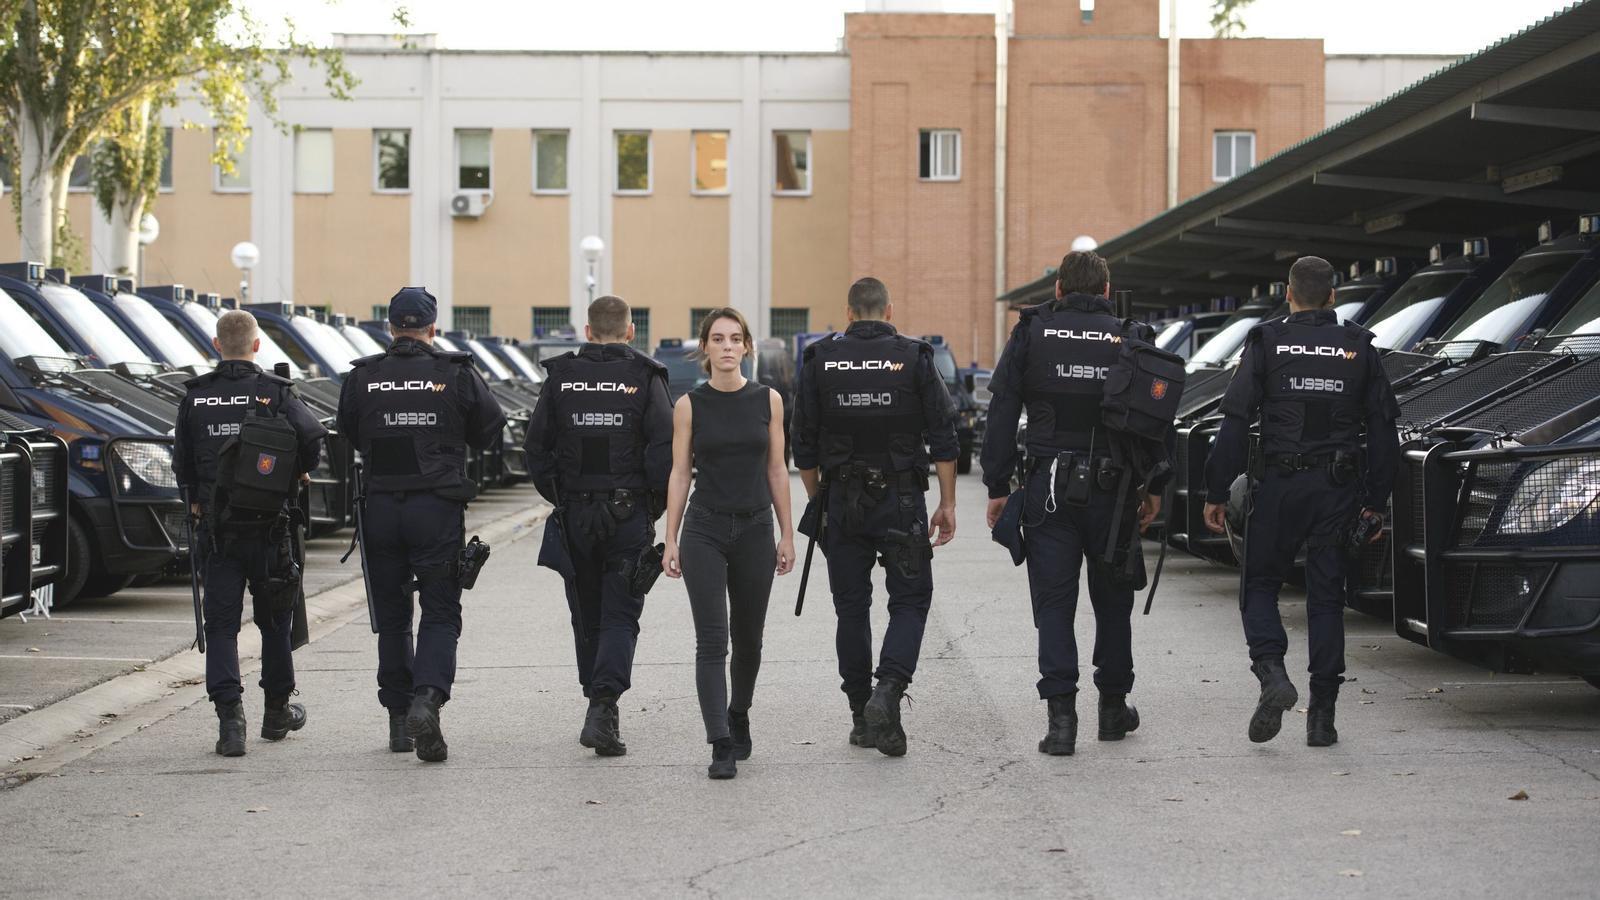 'Antidisturbios' s'endinsa en les tenebres de la violència policial